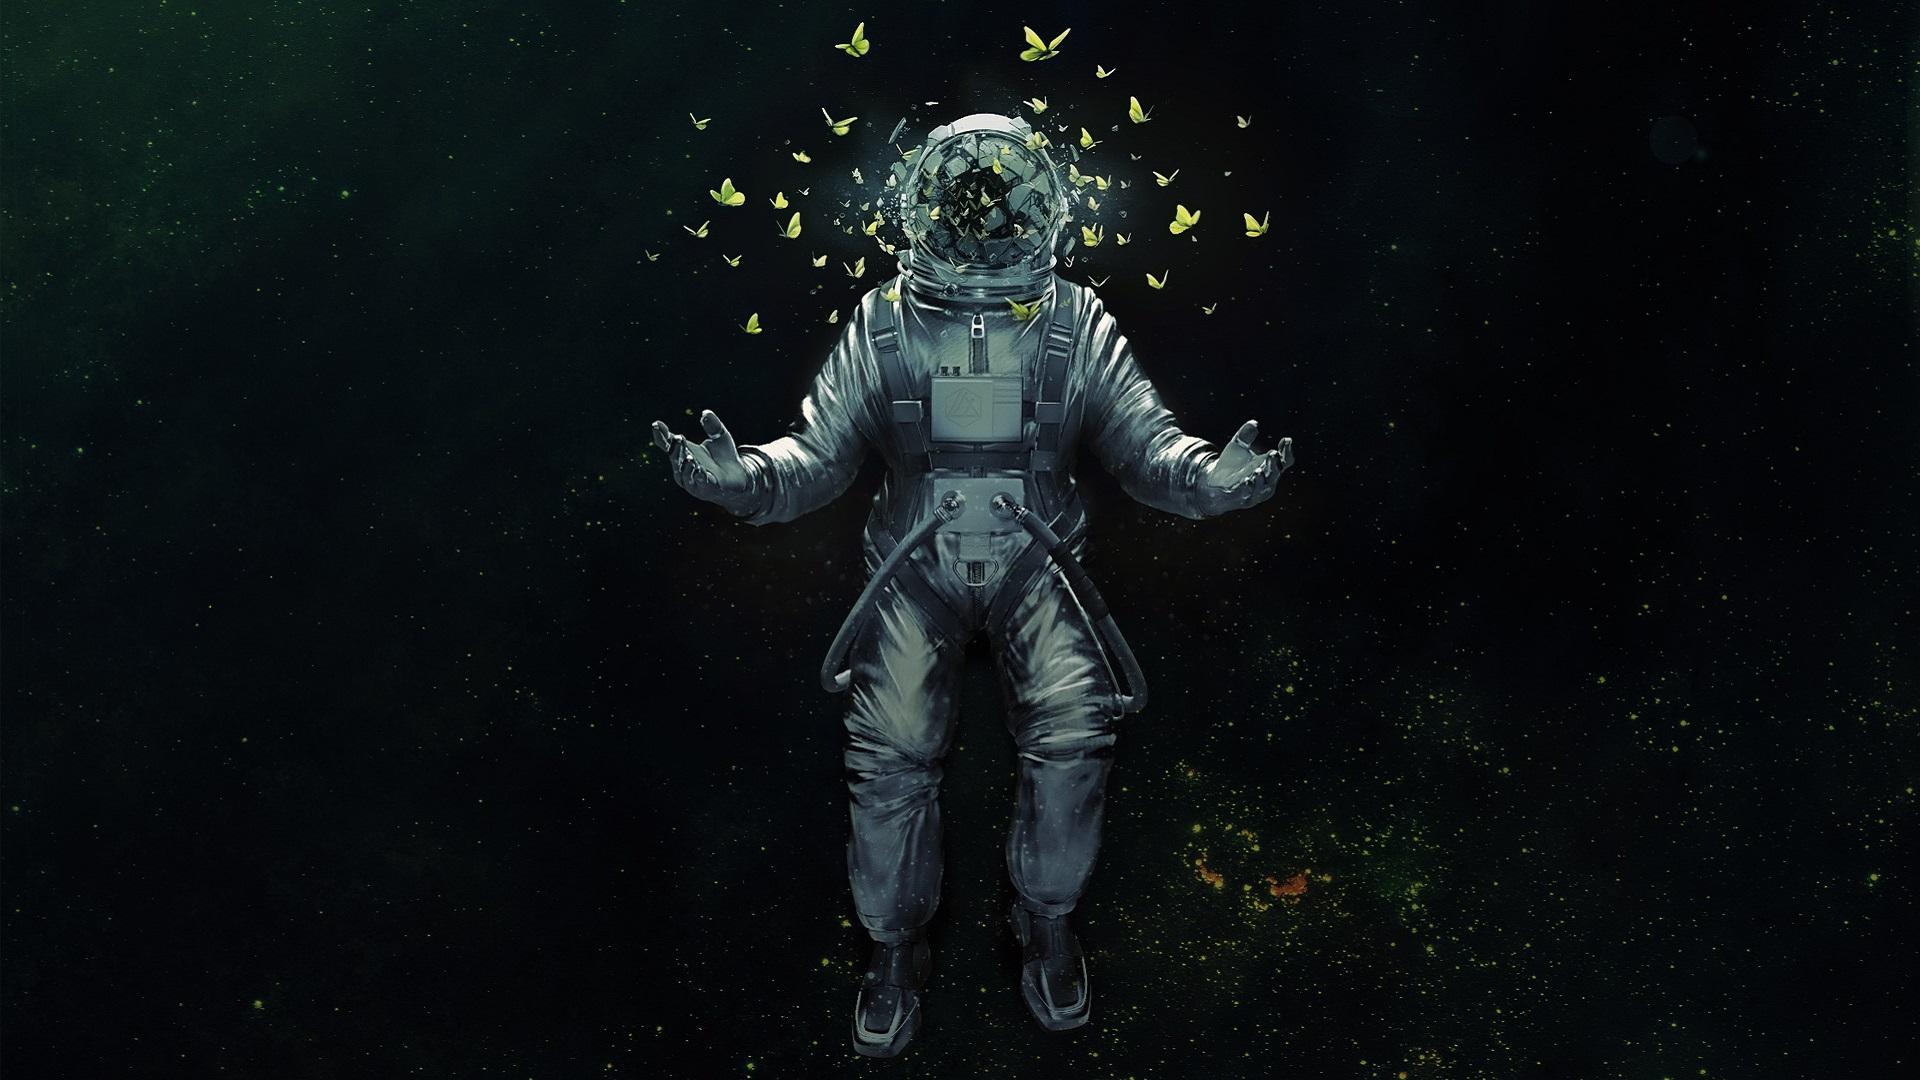 Space Demonic Art Hd Wallpaper: Astronaut Broken Glass Butterfly Space Suit, HD Artist, 4k